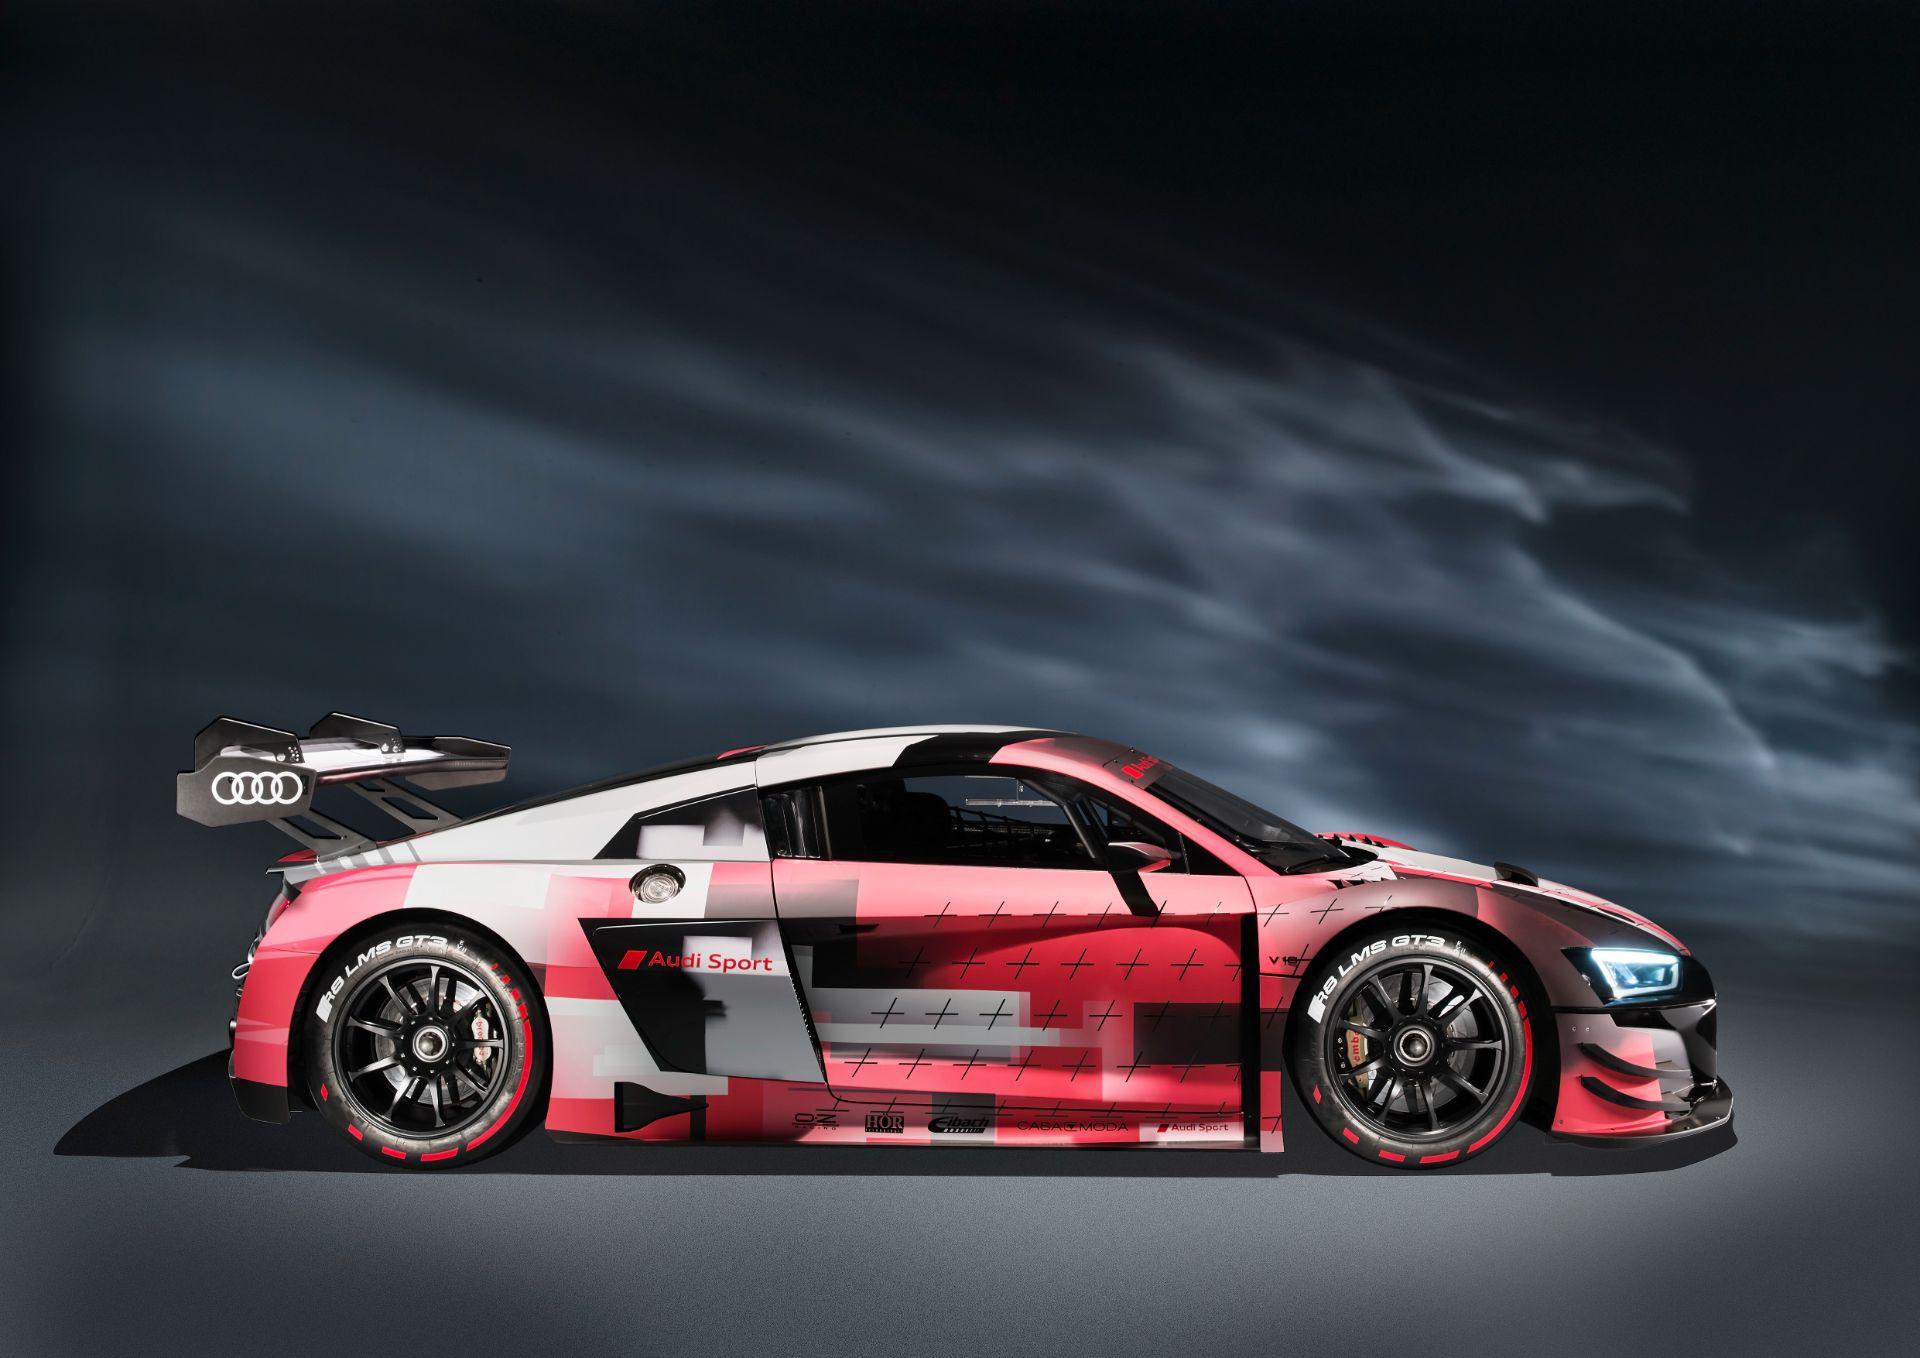 Audi-R8-LMS-GT3-Evo-II-9